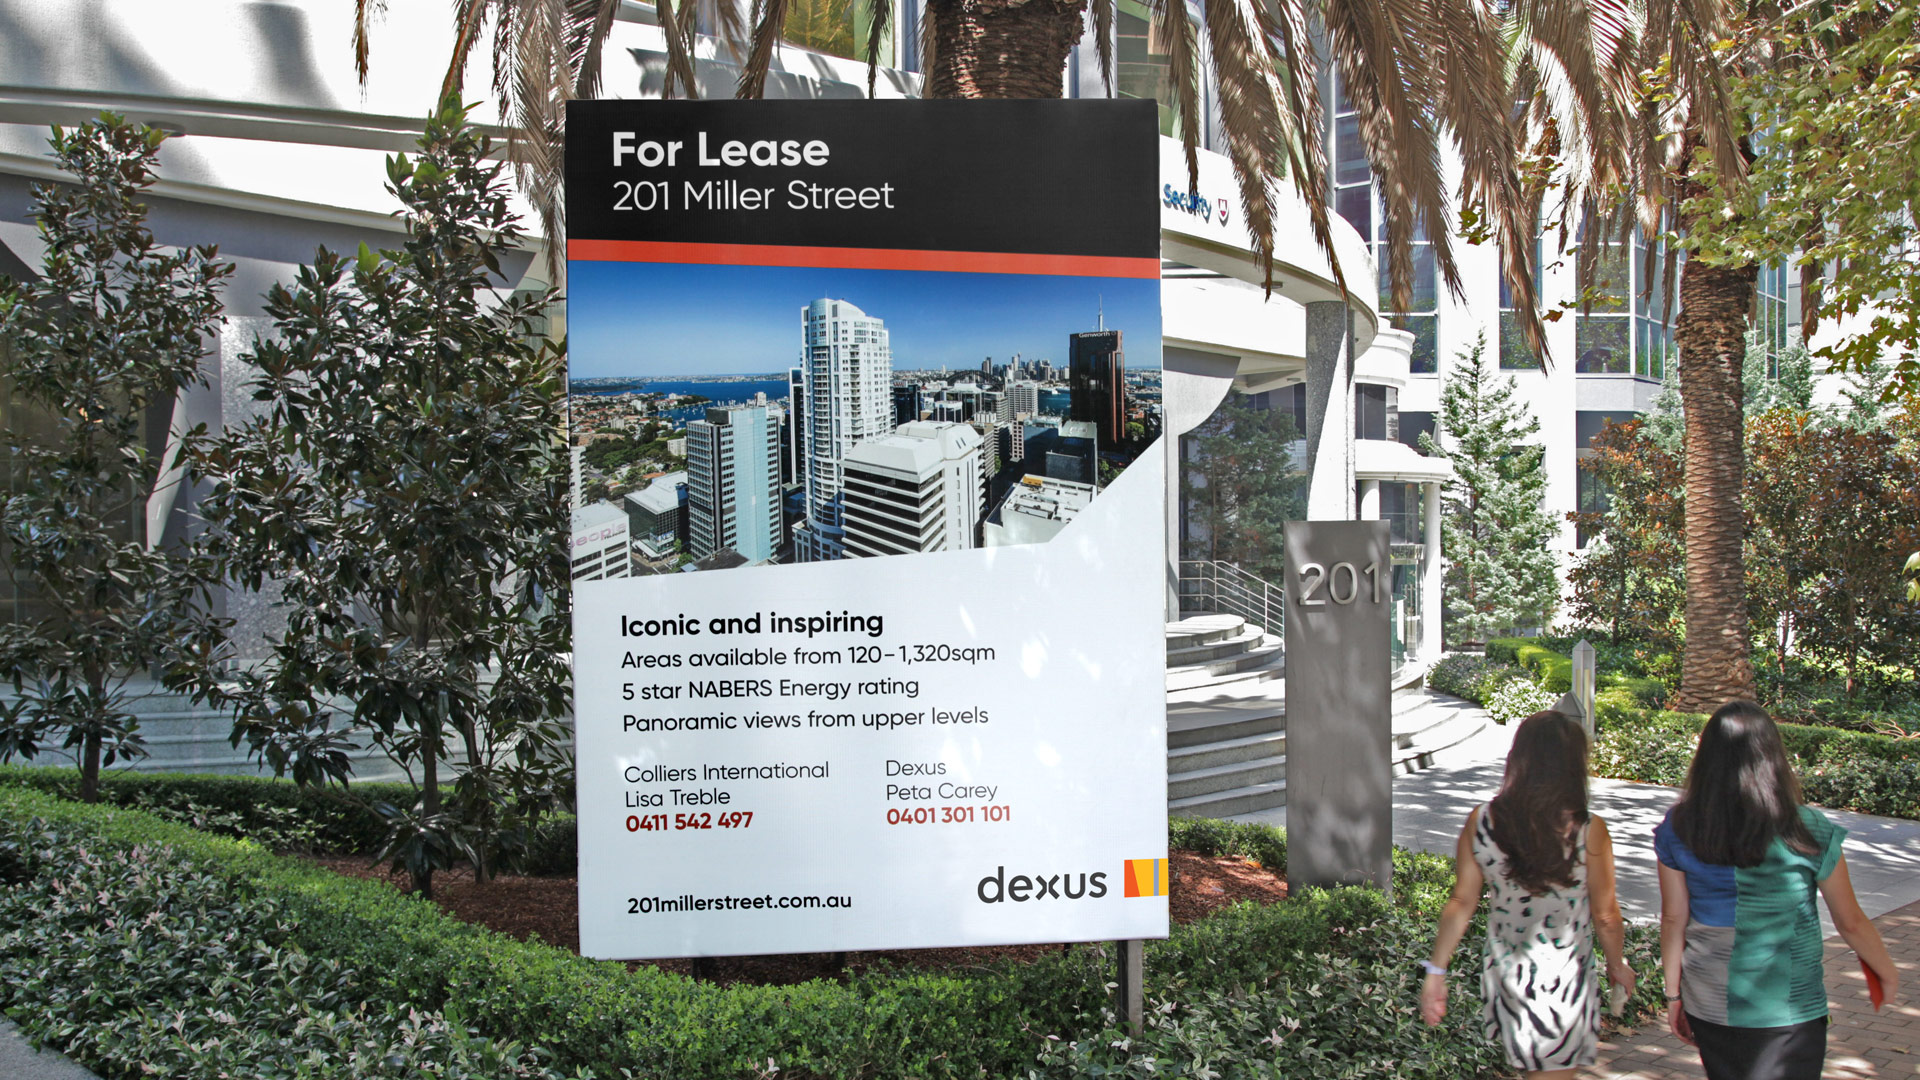 dexus-brand-id-9.jpg